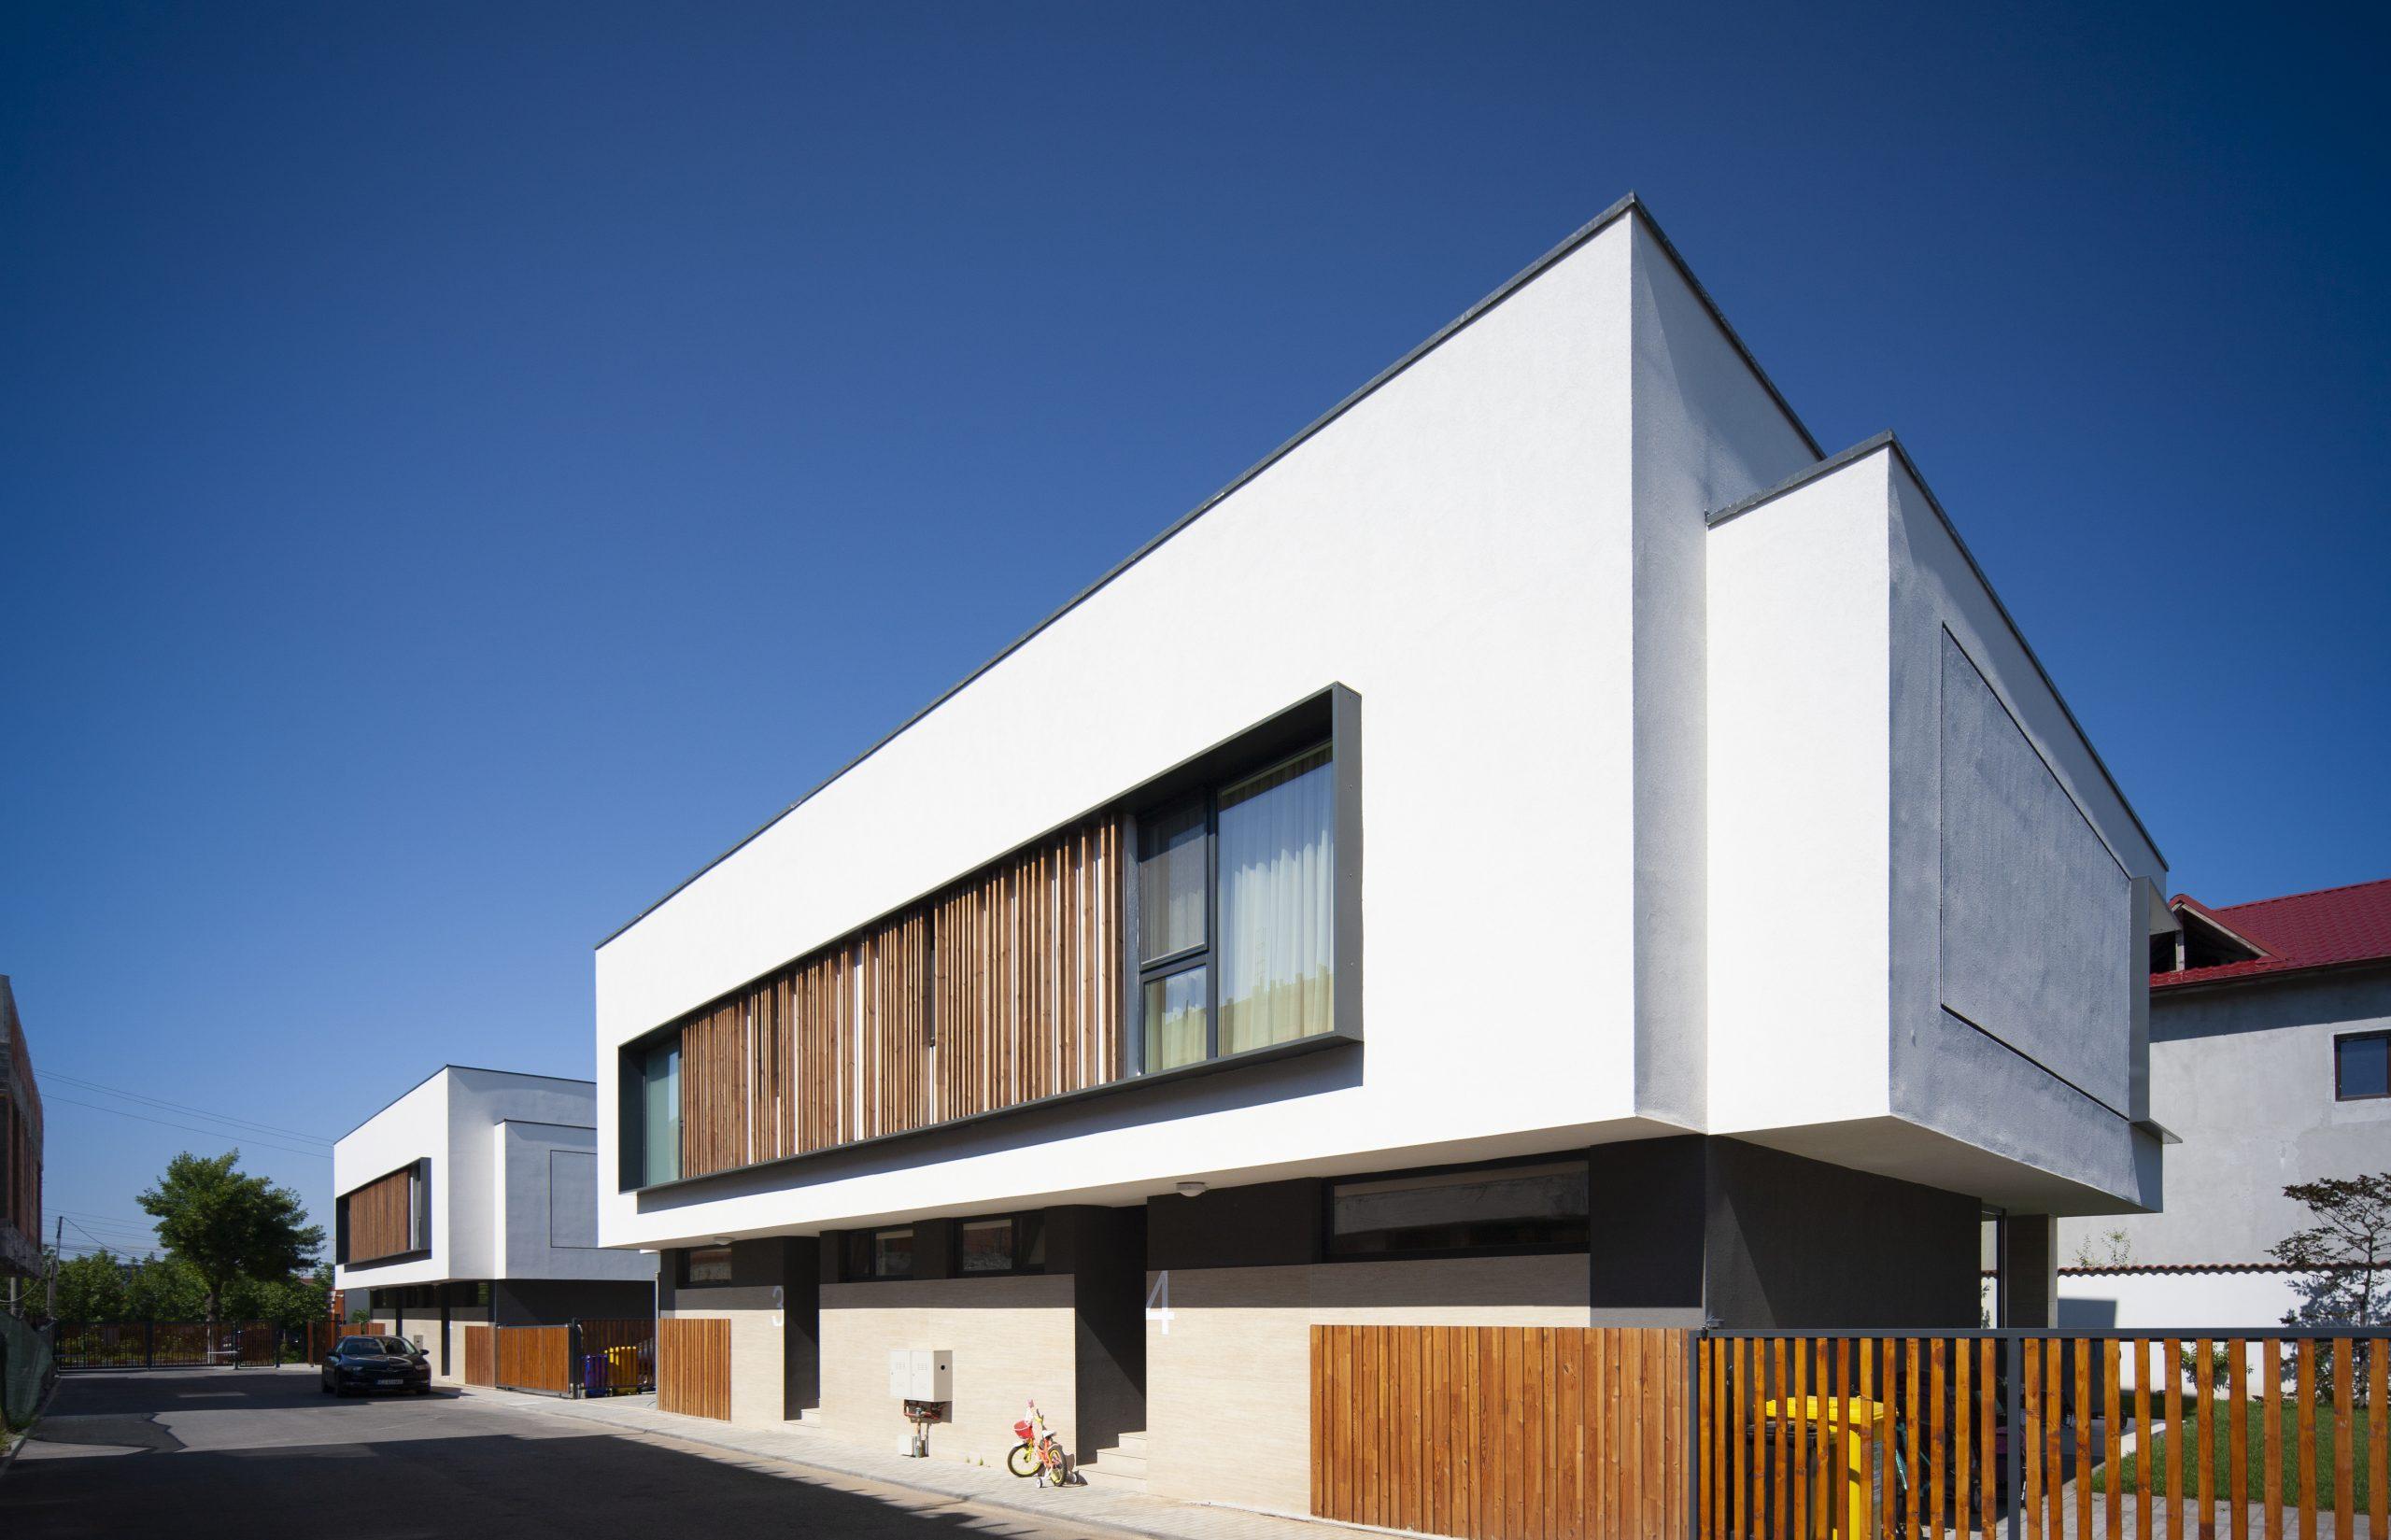 https://nbc-arhitect.ro/wp-content/uploads/2020/10/NBC-Arhitect-_-residentials-_-Contemporan-Residence-_-Bucharest-Romania_10-1-scaled.jpg